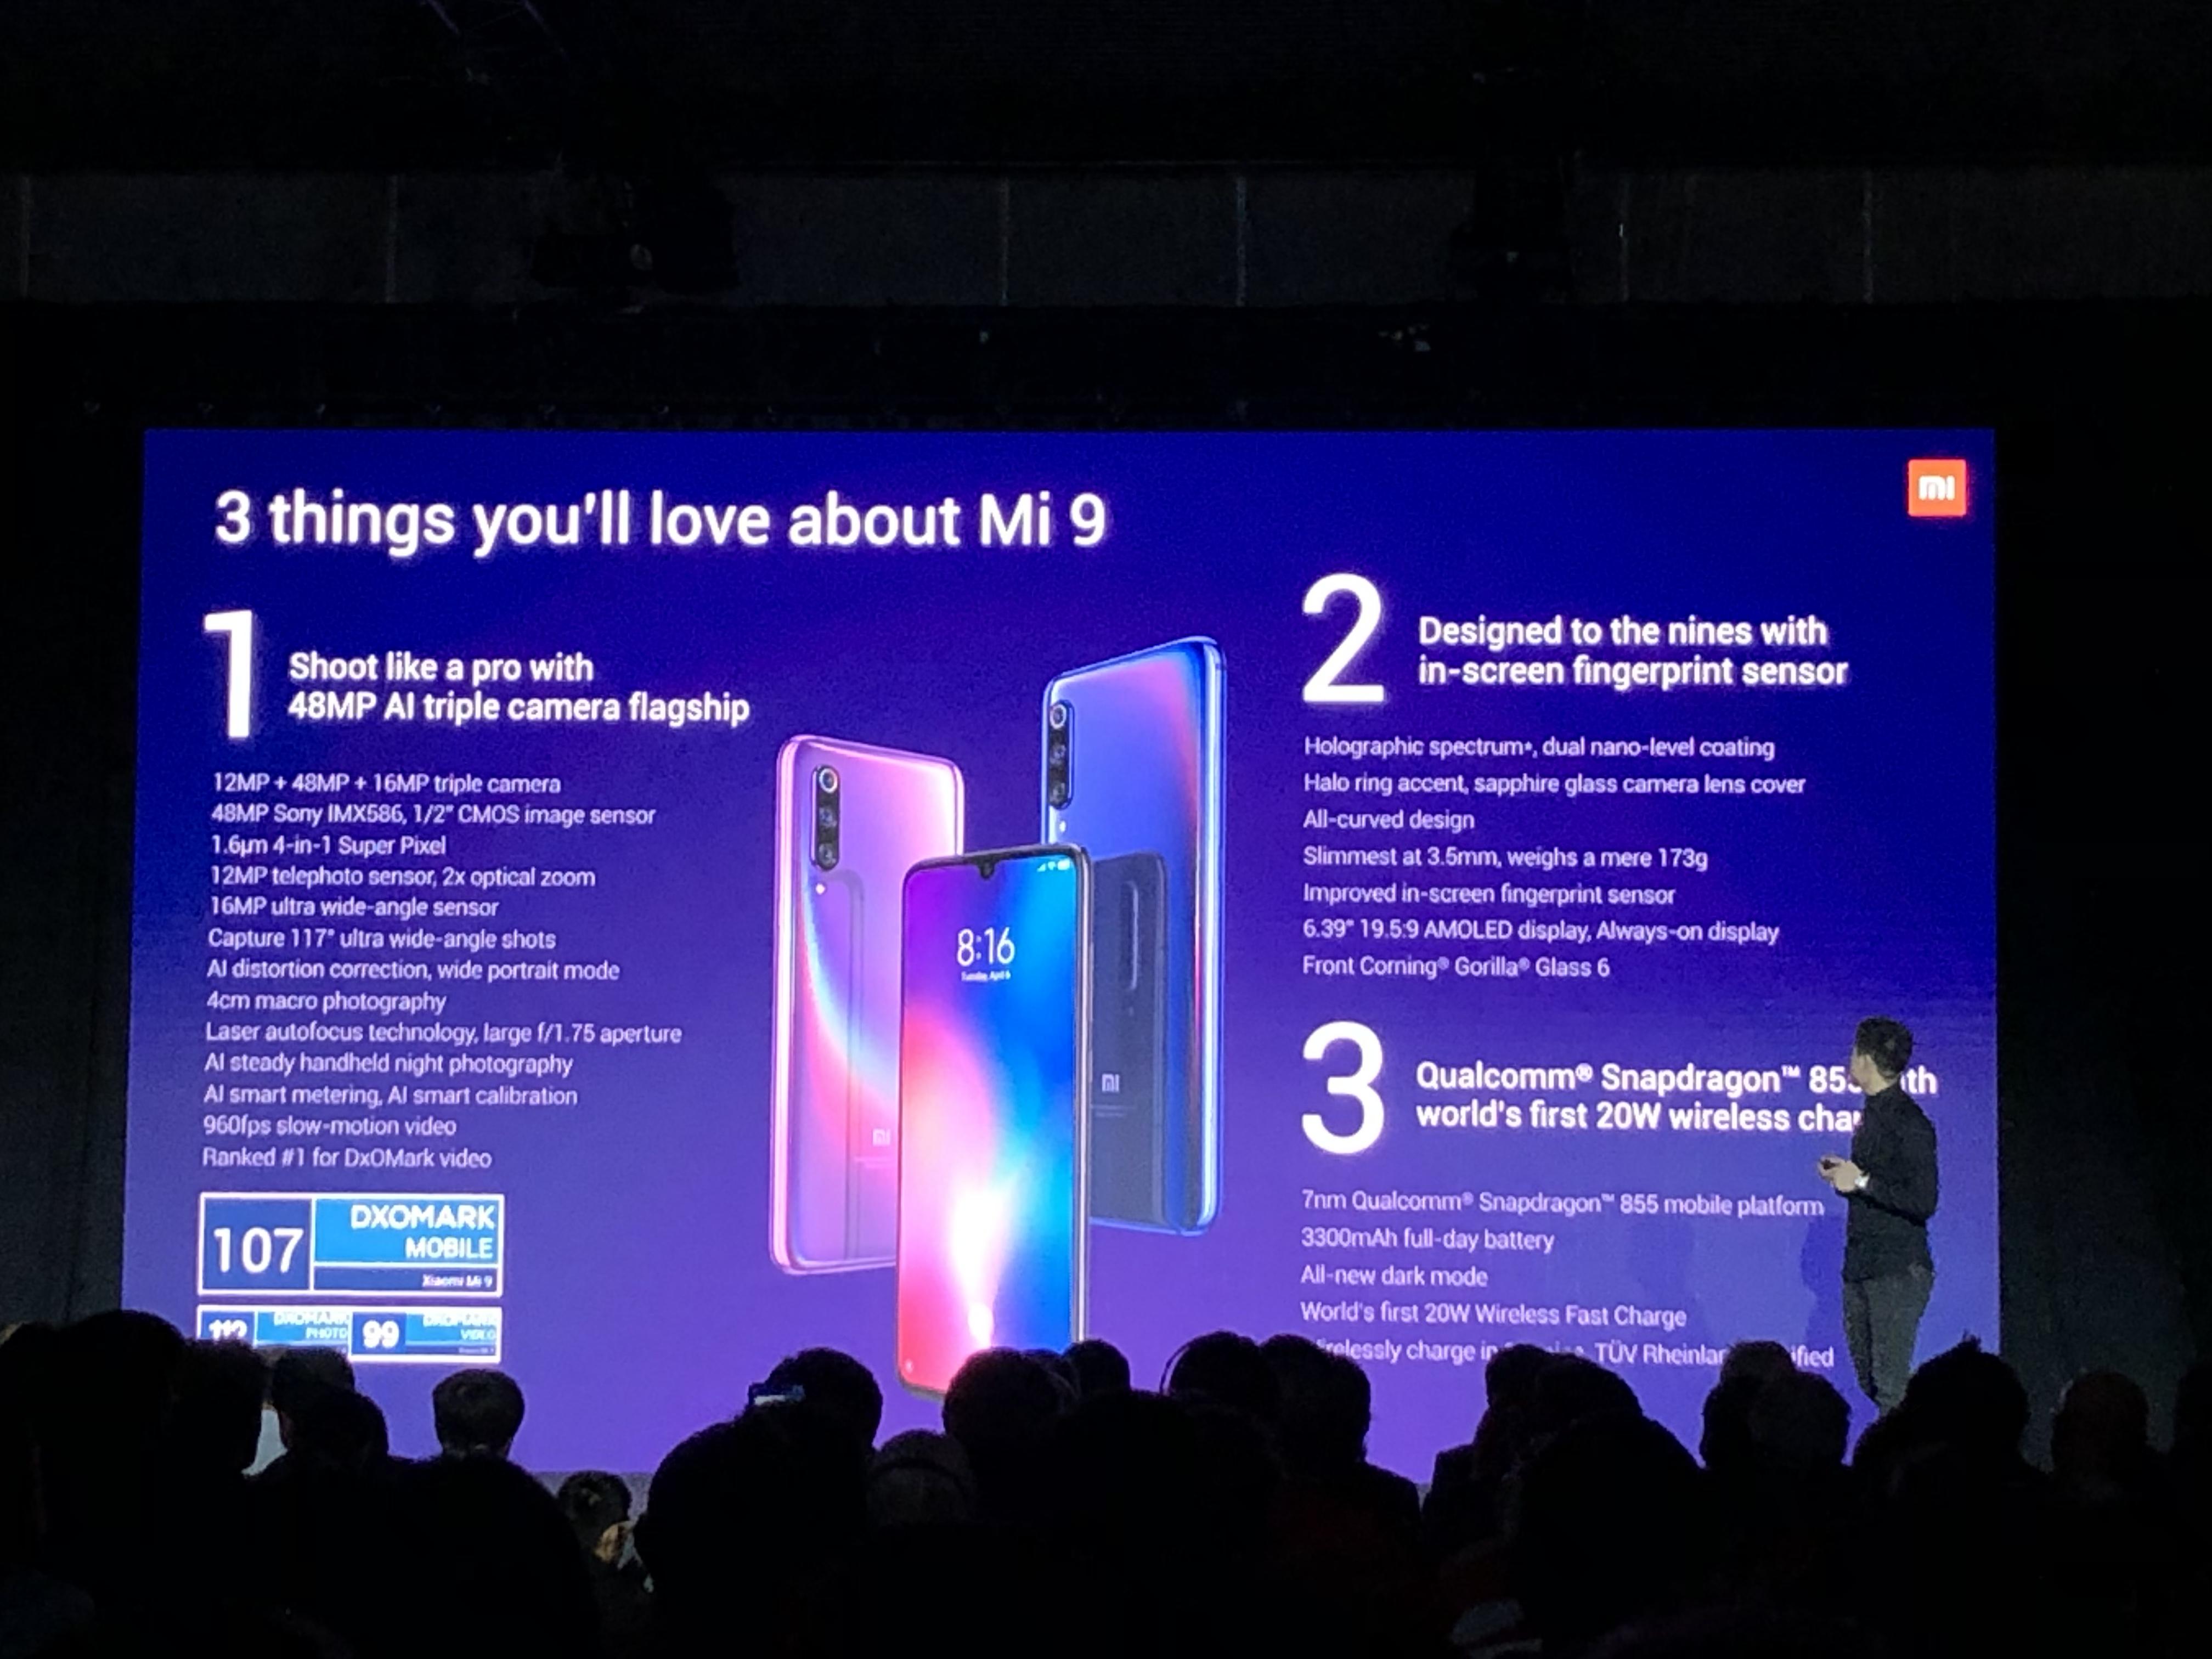 Xiaomi announces its first 5G phone, the Mi Mix 3 5G